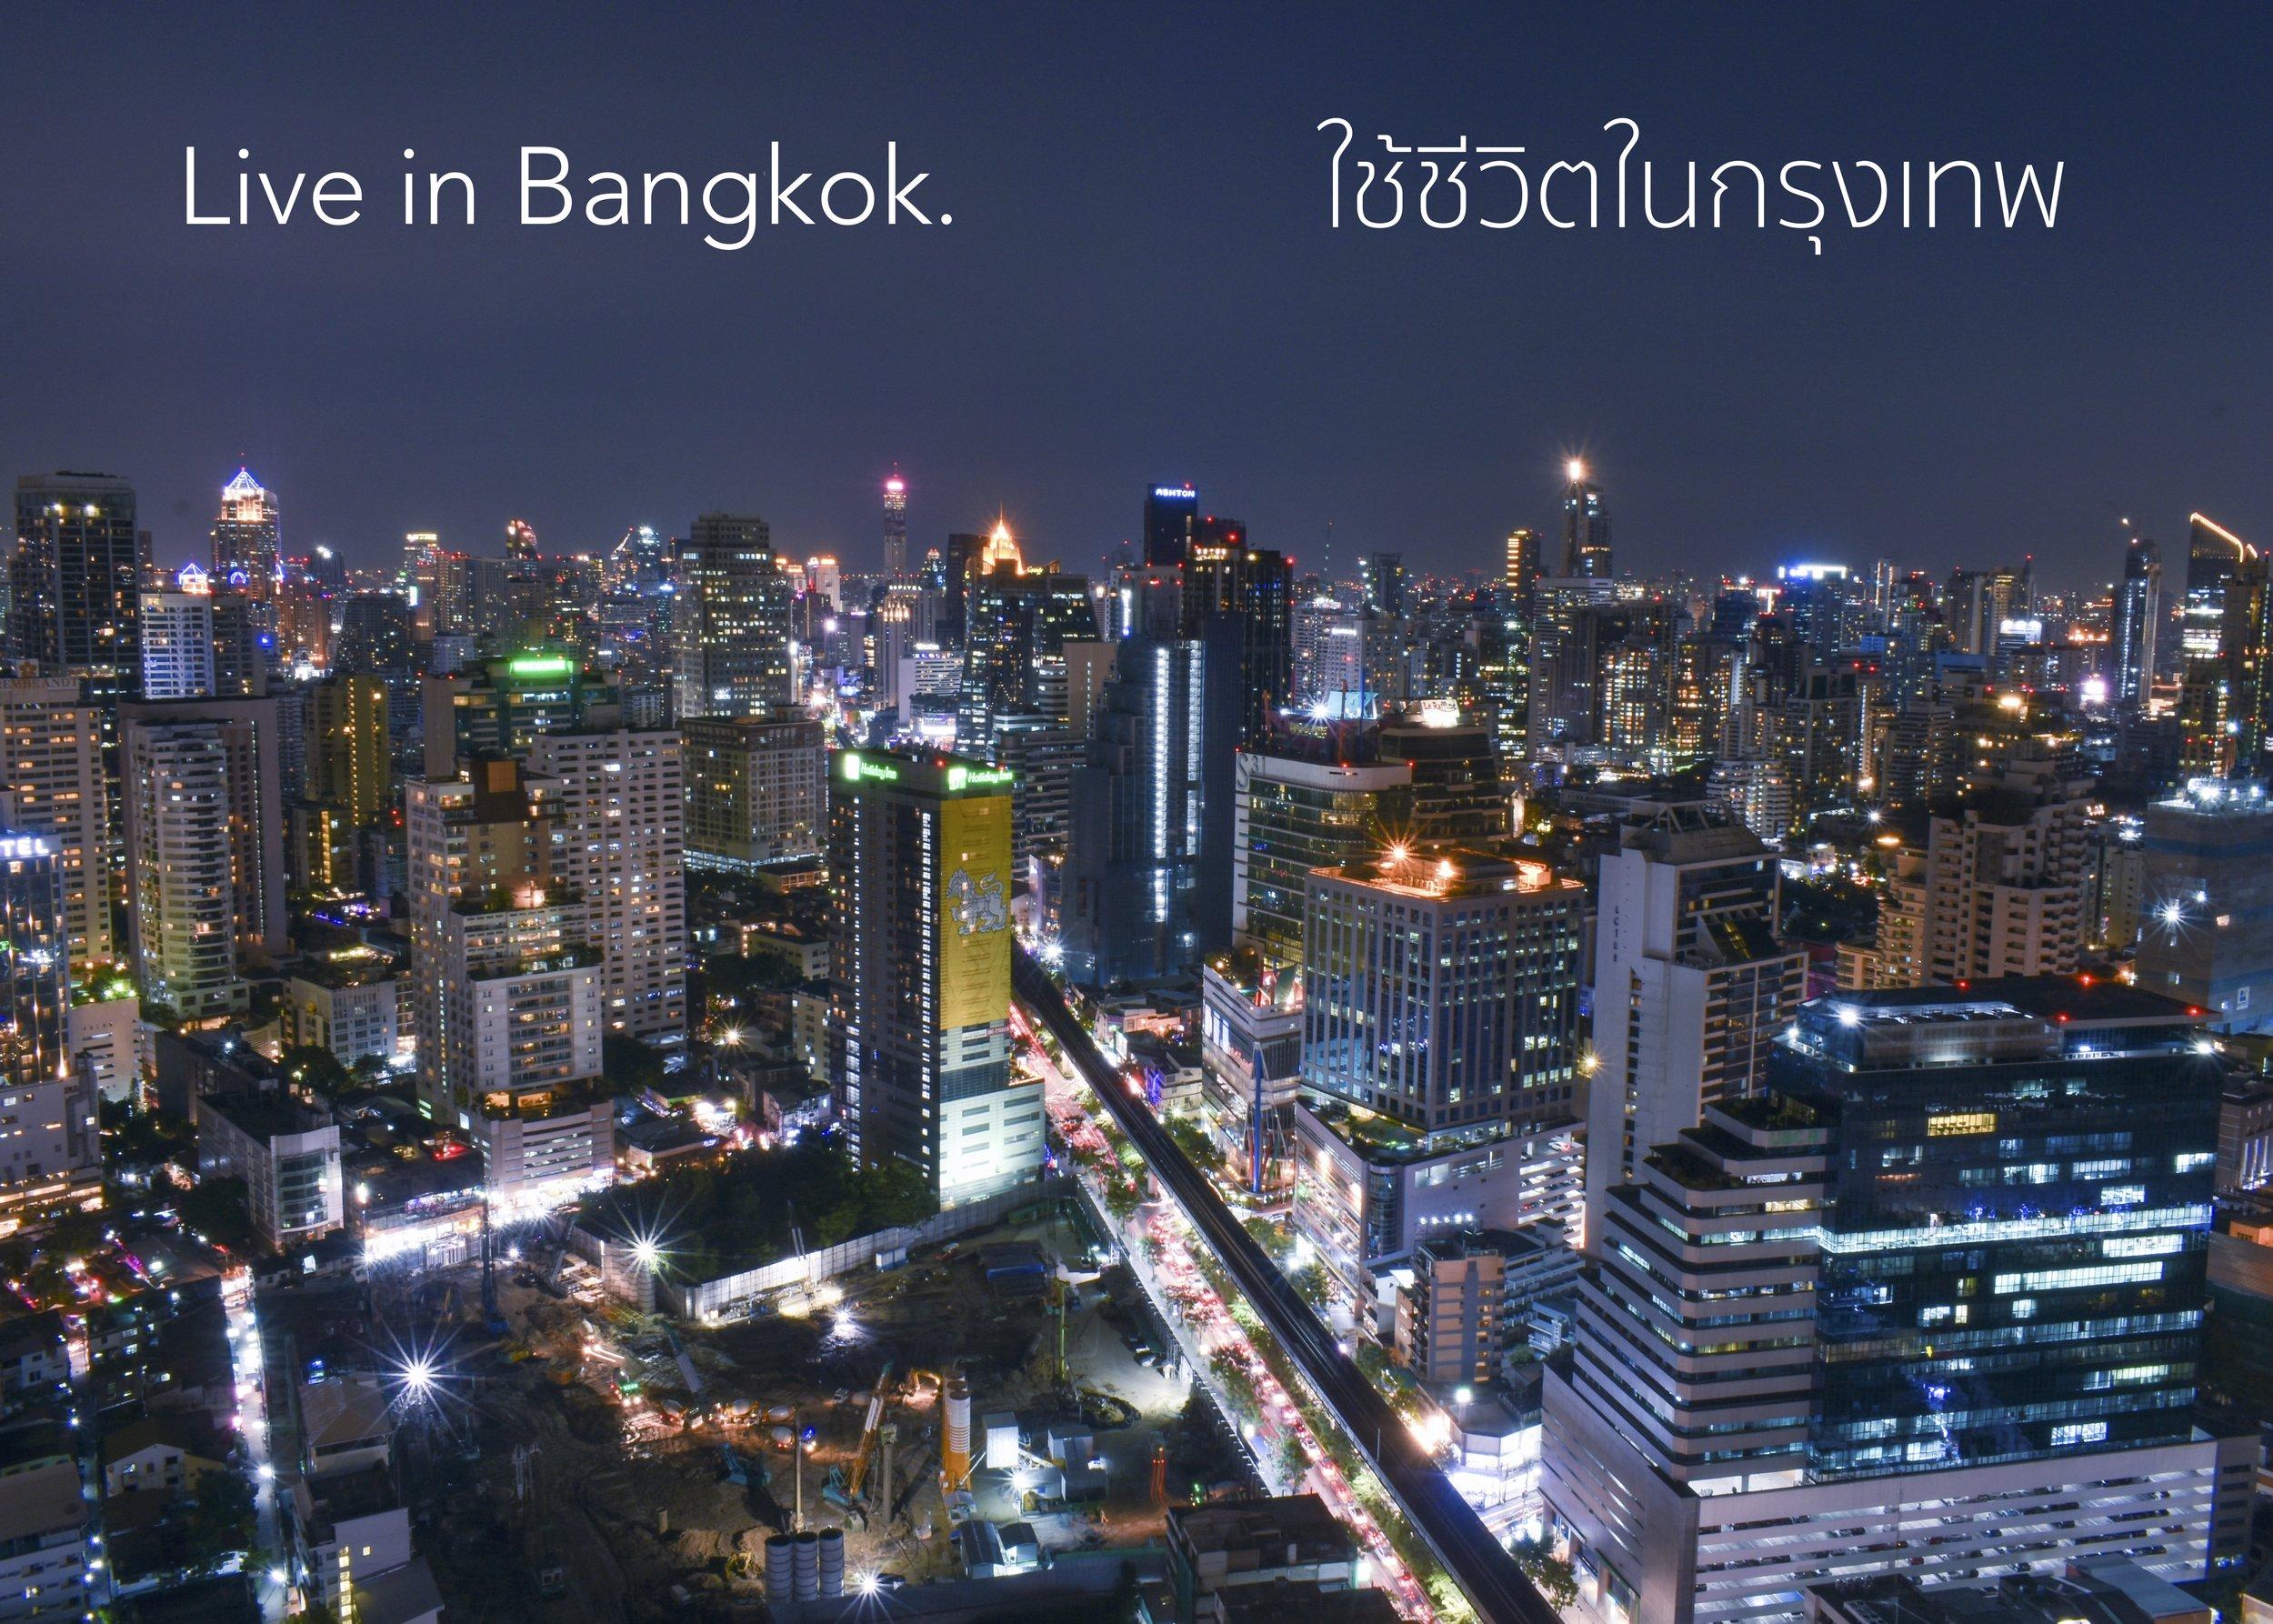 live in bangkok.jpg